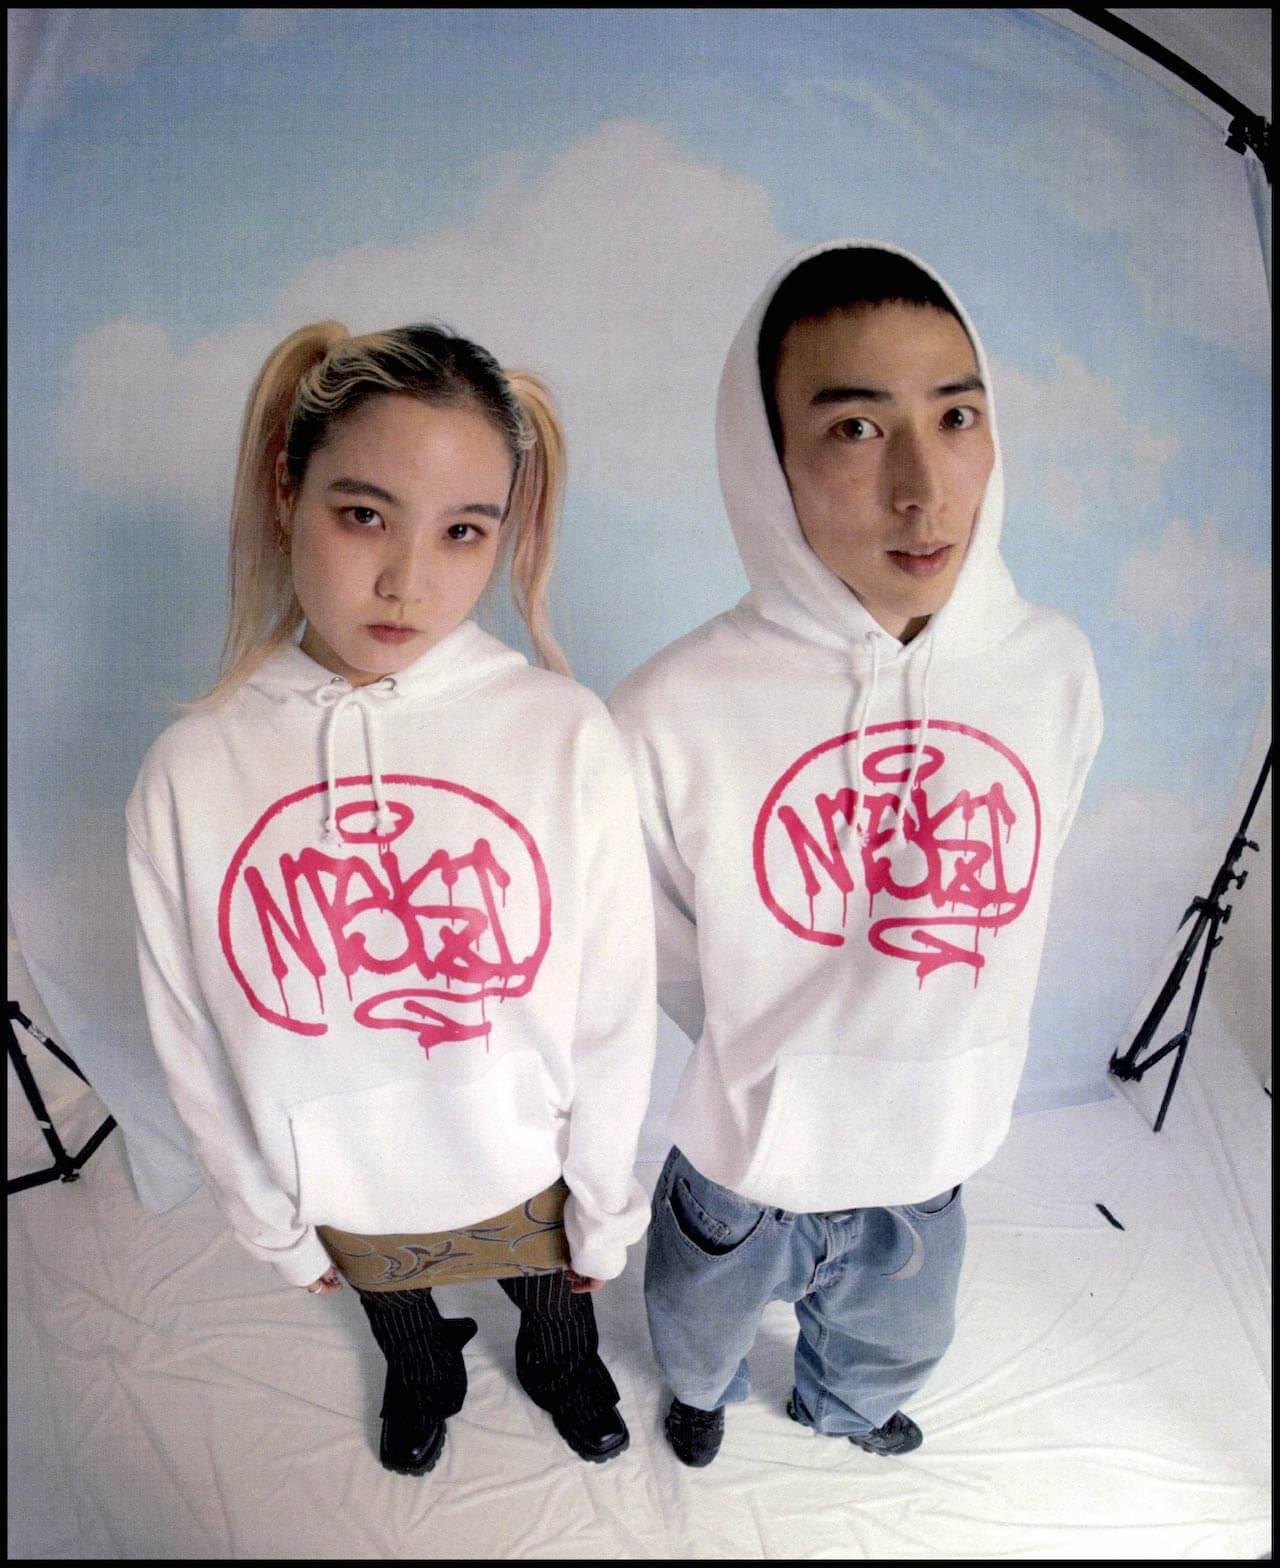 NTsKiが「K/A/T/O MASSACRE」のライブ映像を公開、SIDE CORE・DIEGOとのコラボグッズ発売 music210501-ntski-1